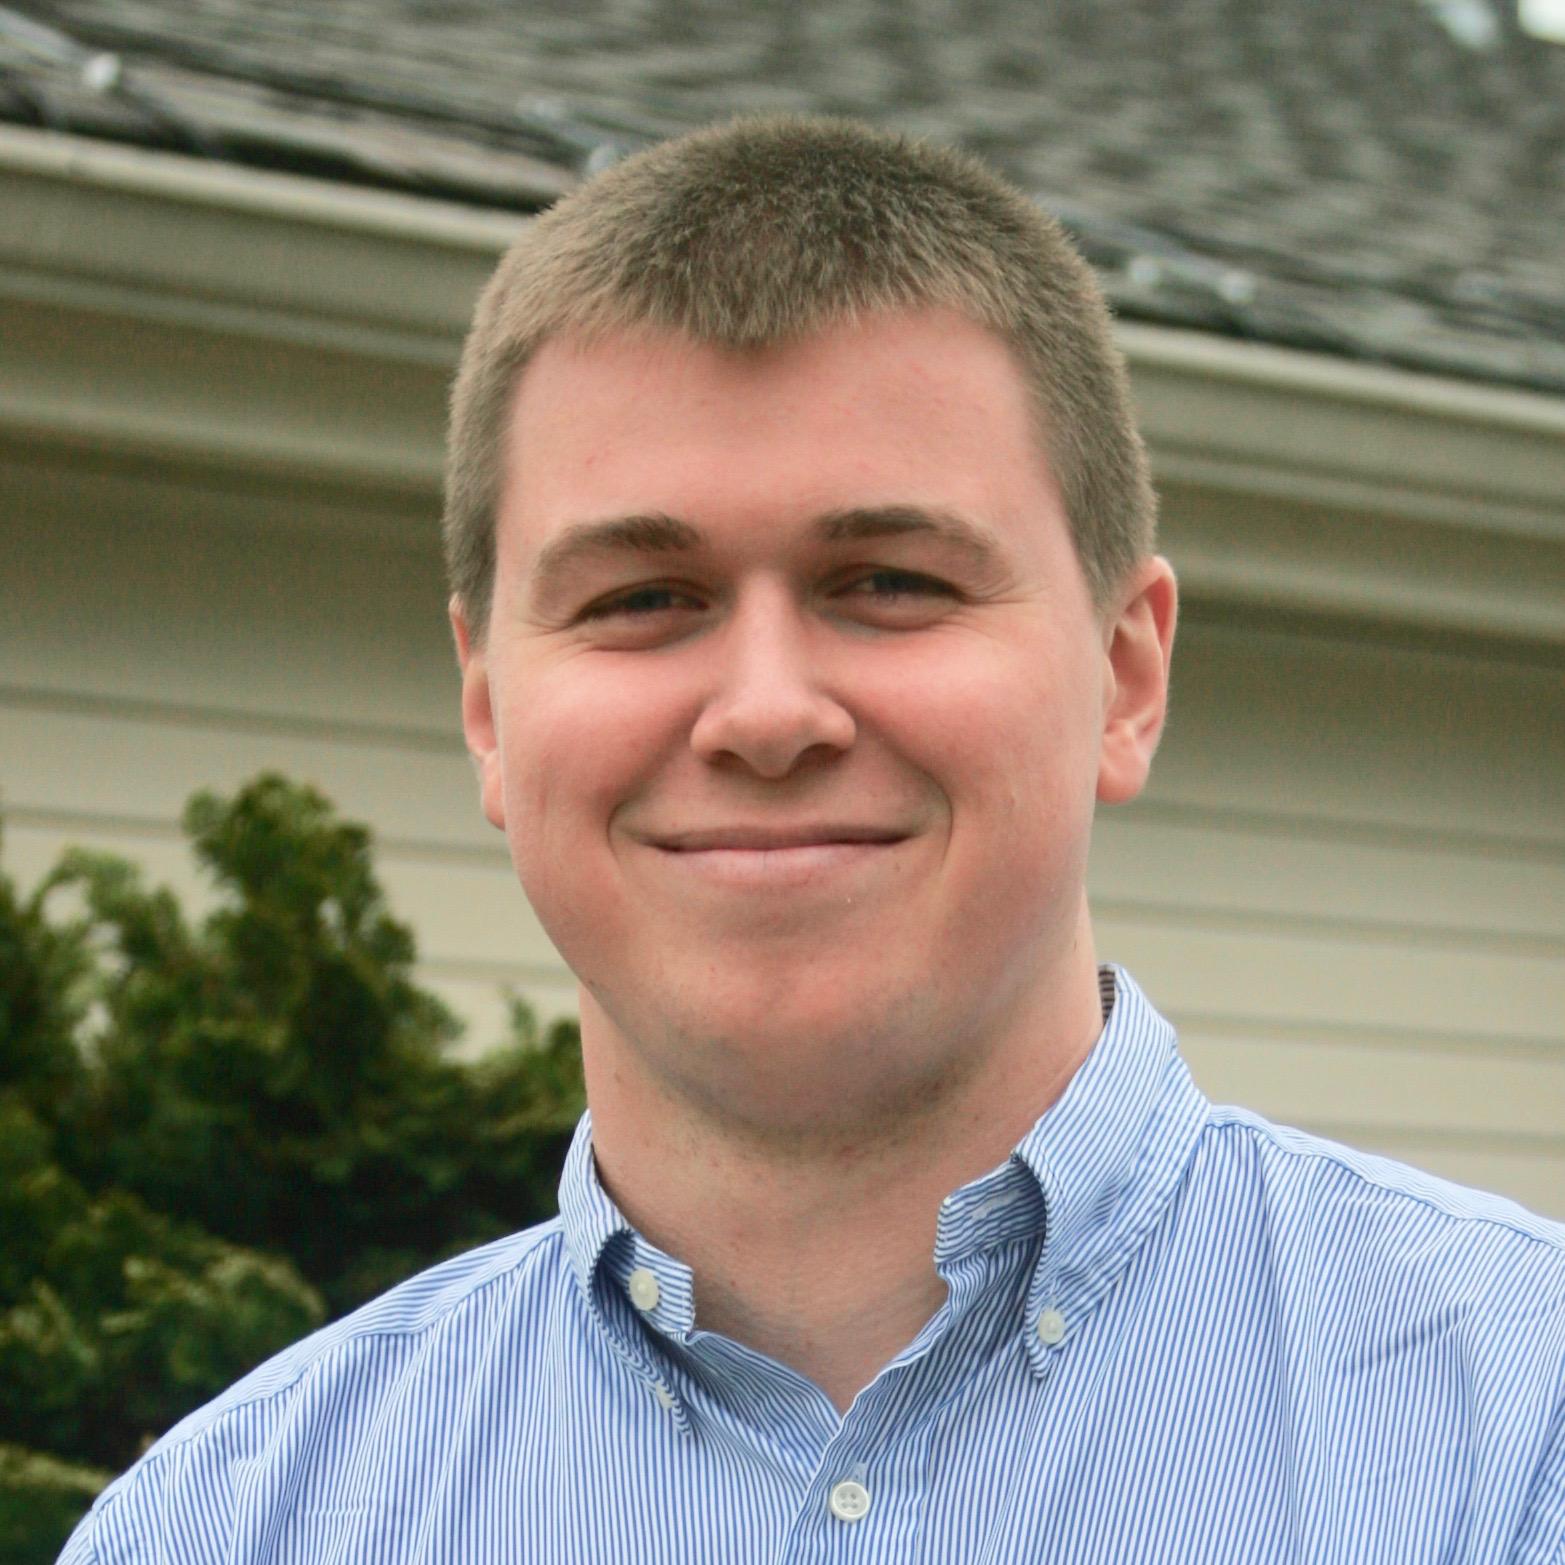 Phil Noonan '20